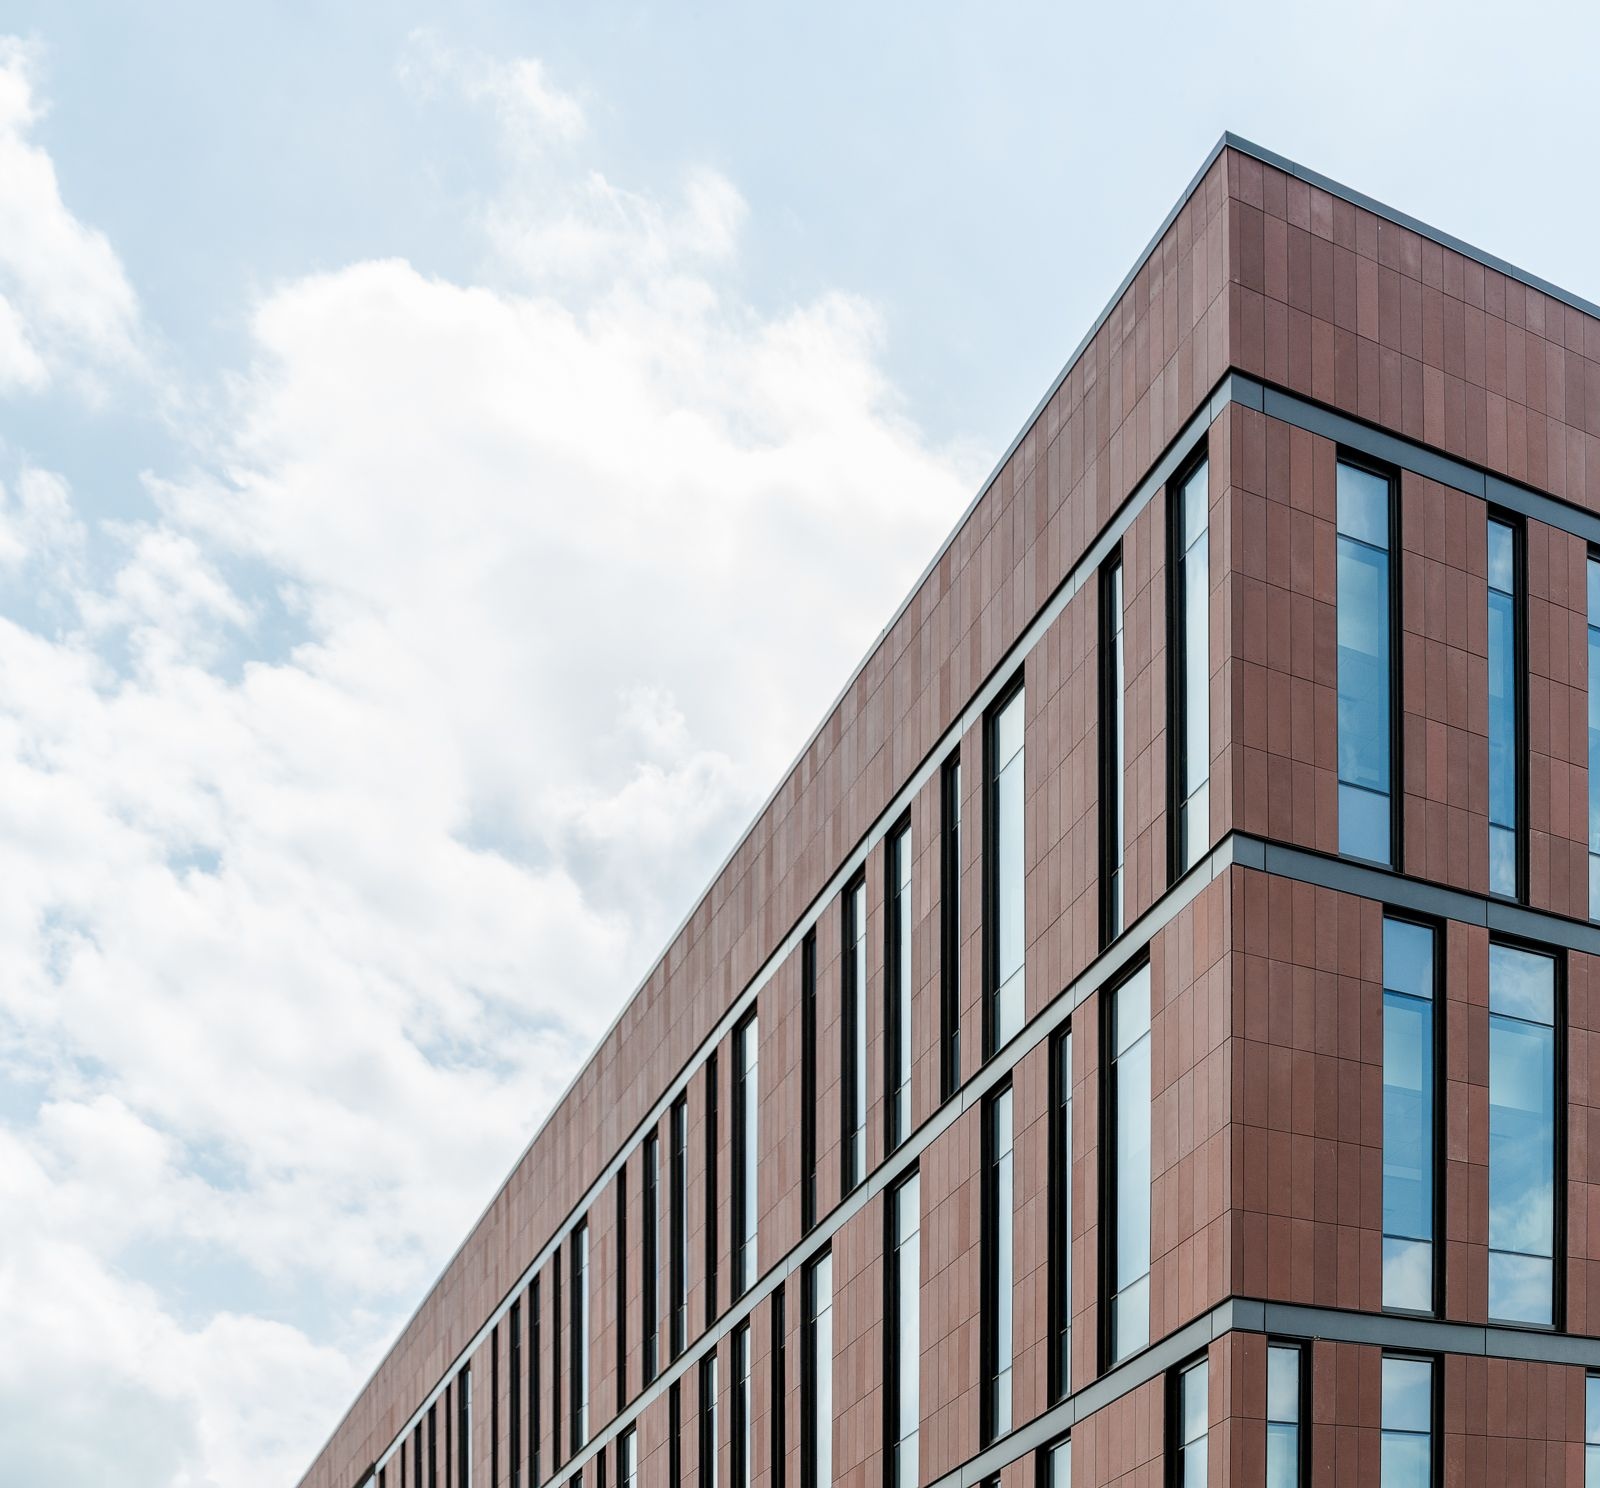 SUNY Farmingdale School of Business TAKTL Facade Panels Higher Education Projects Pinterest